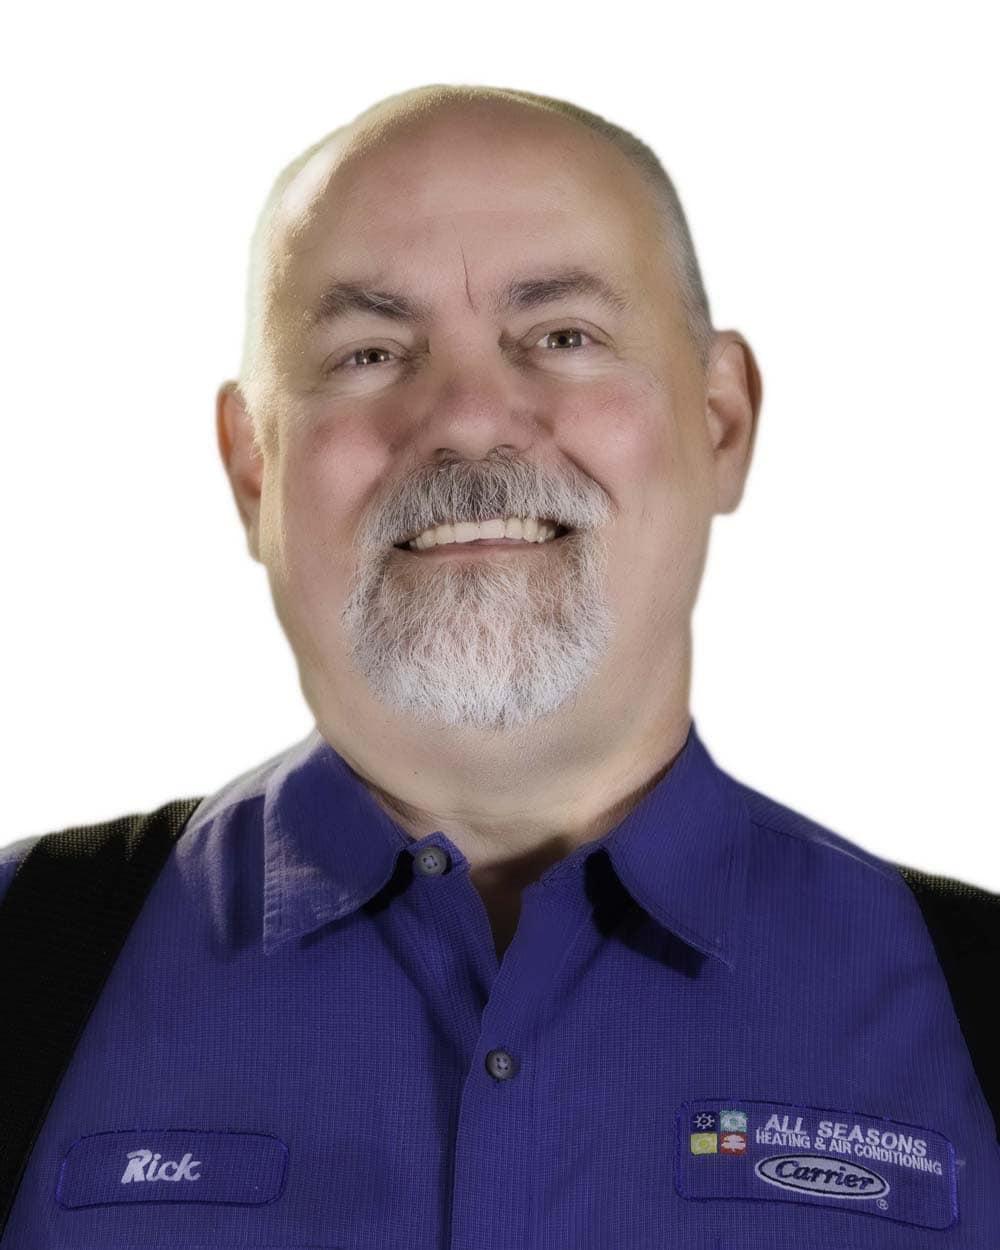 Rick K